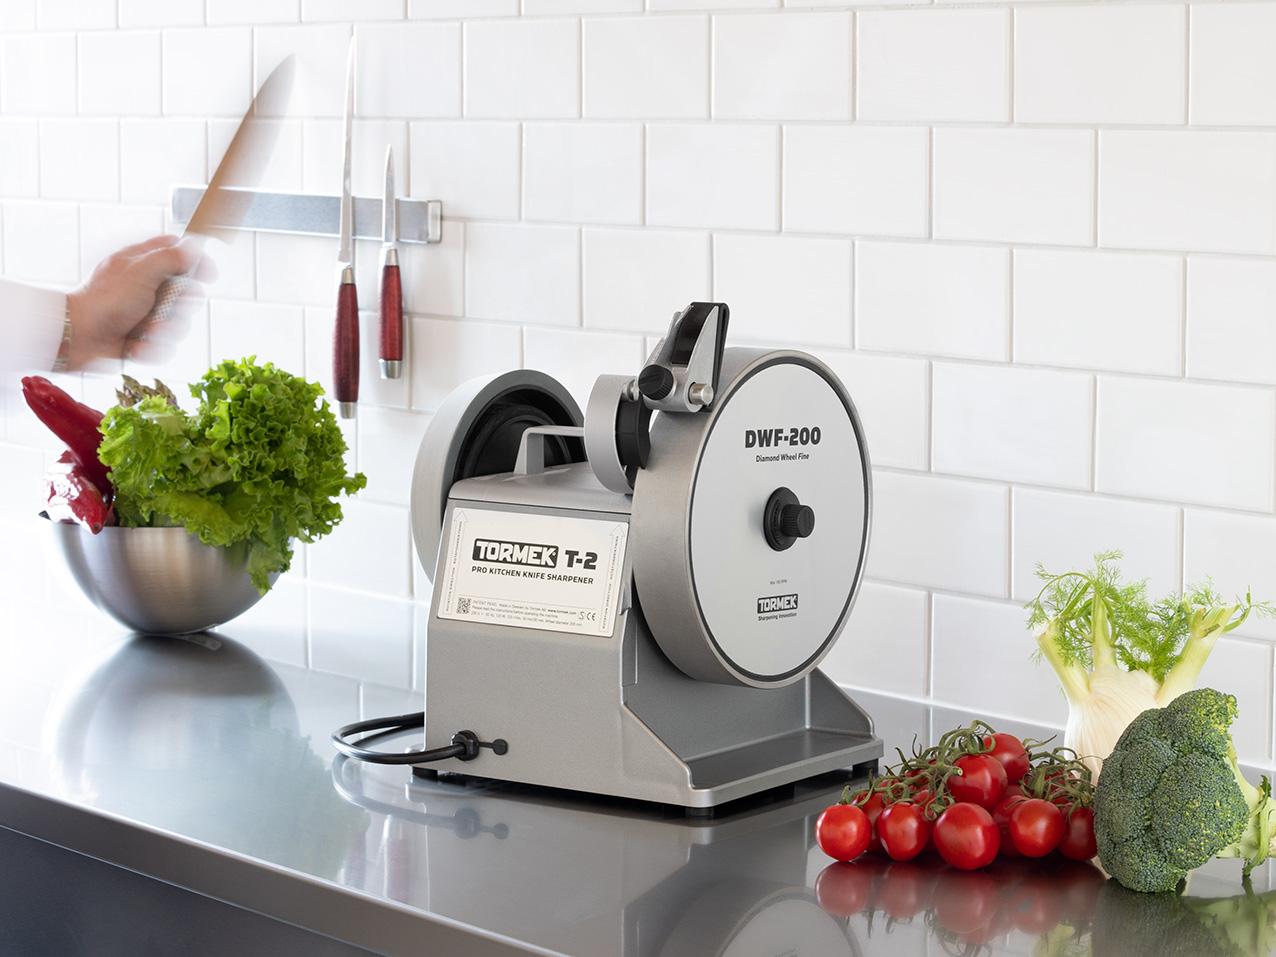 Tormek ®  T-2  Pro Kitchen